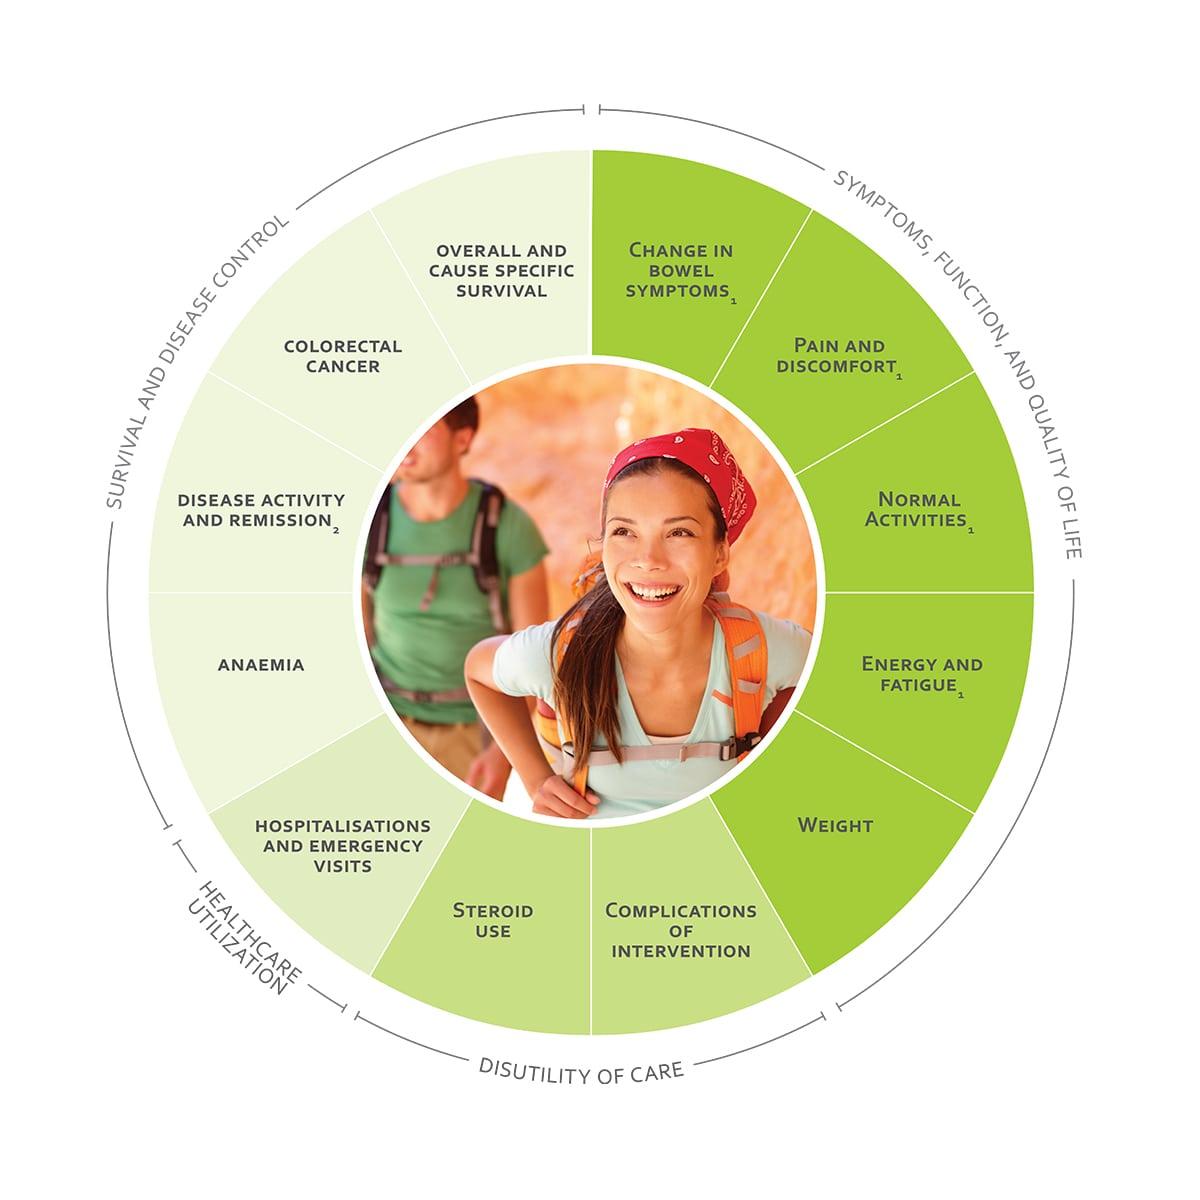 ICHOM Standard Sets Inflammatory Bowel Disease Outcomes Wheel